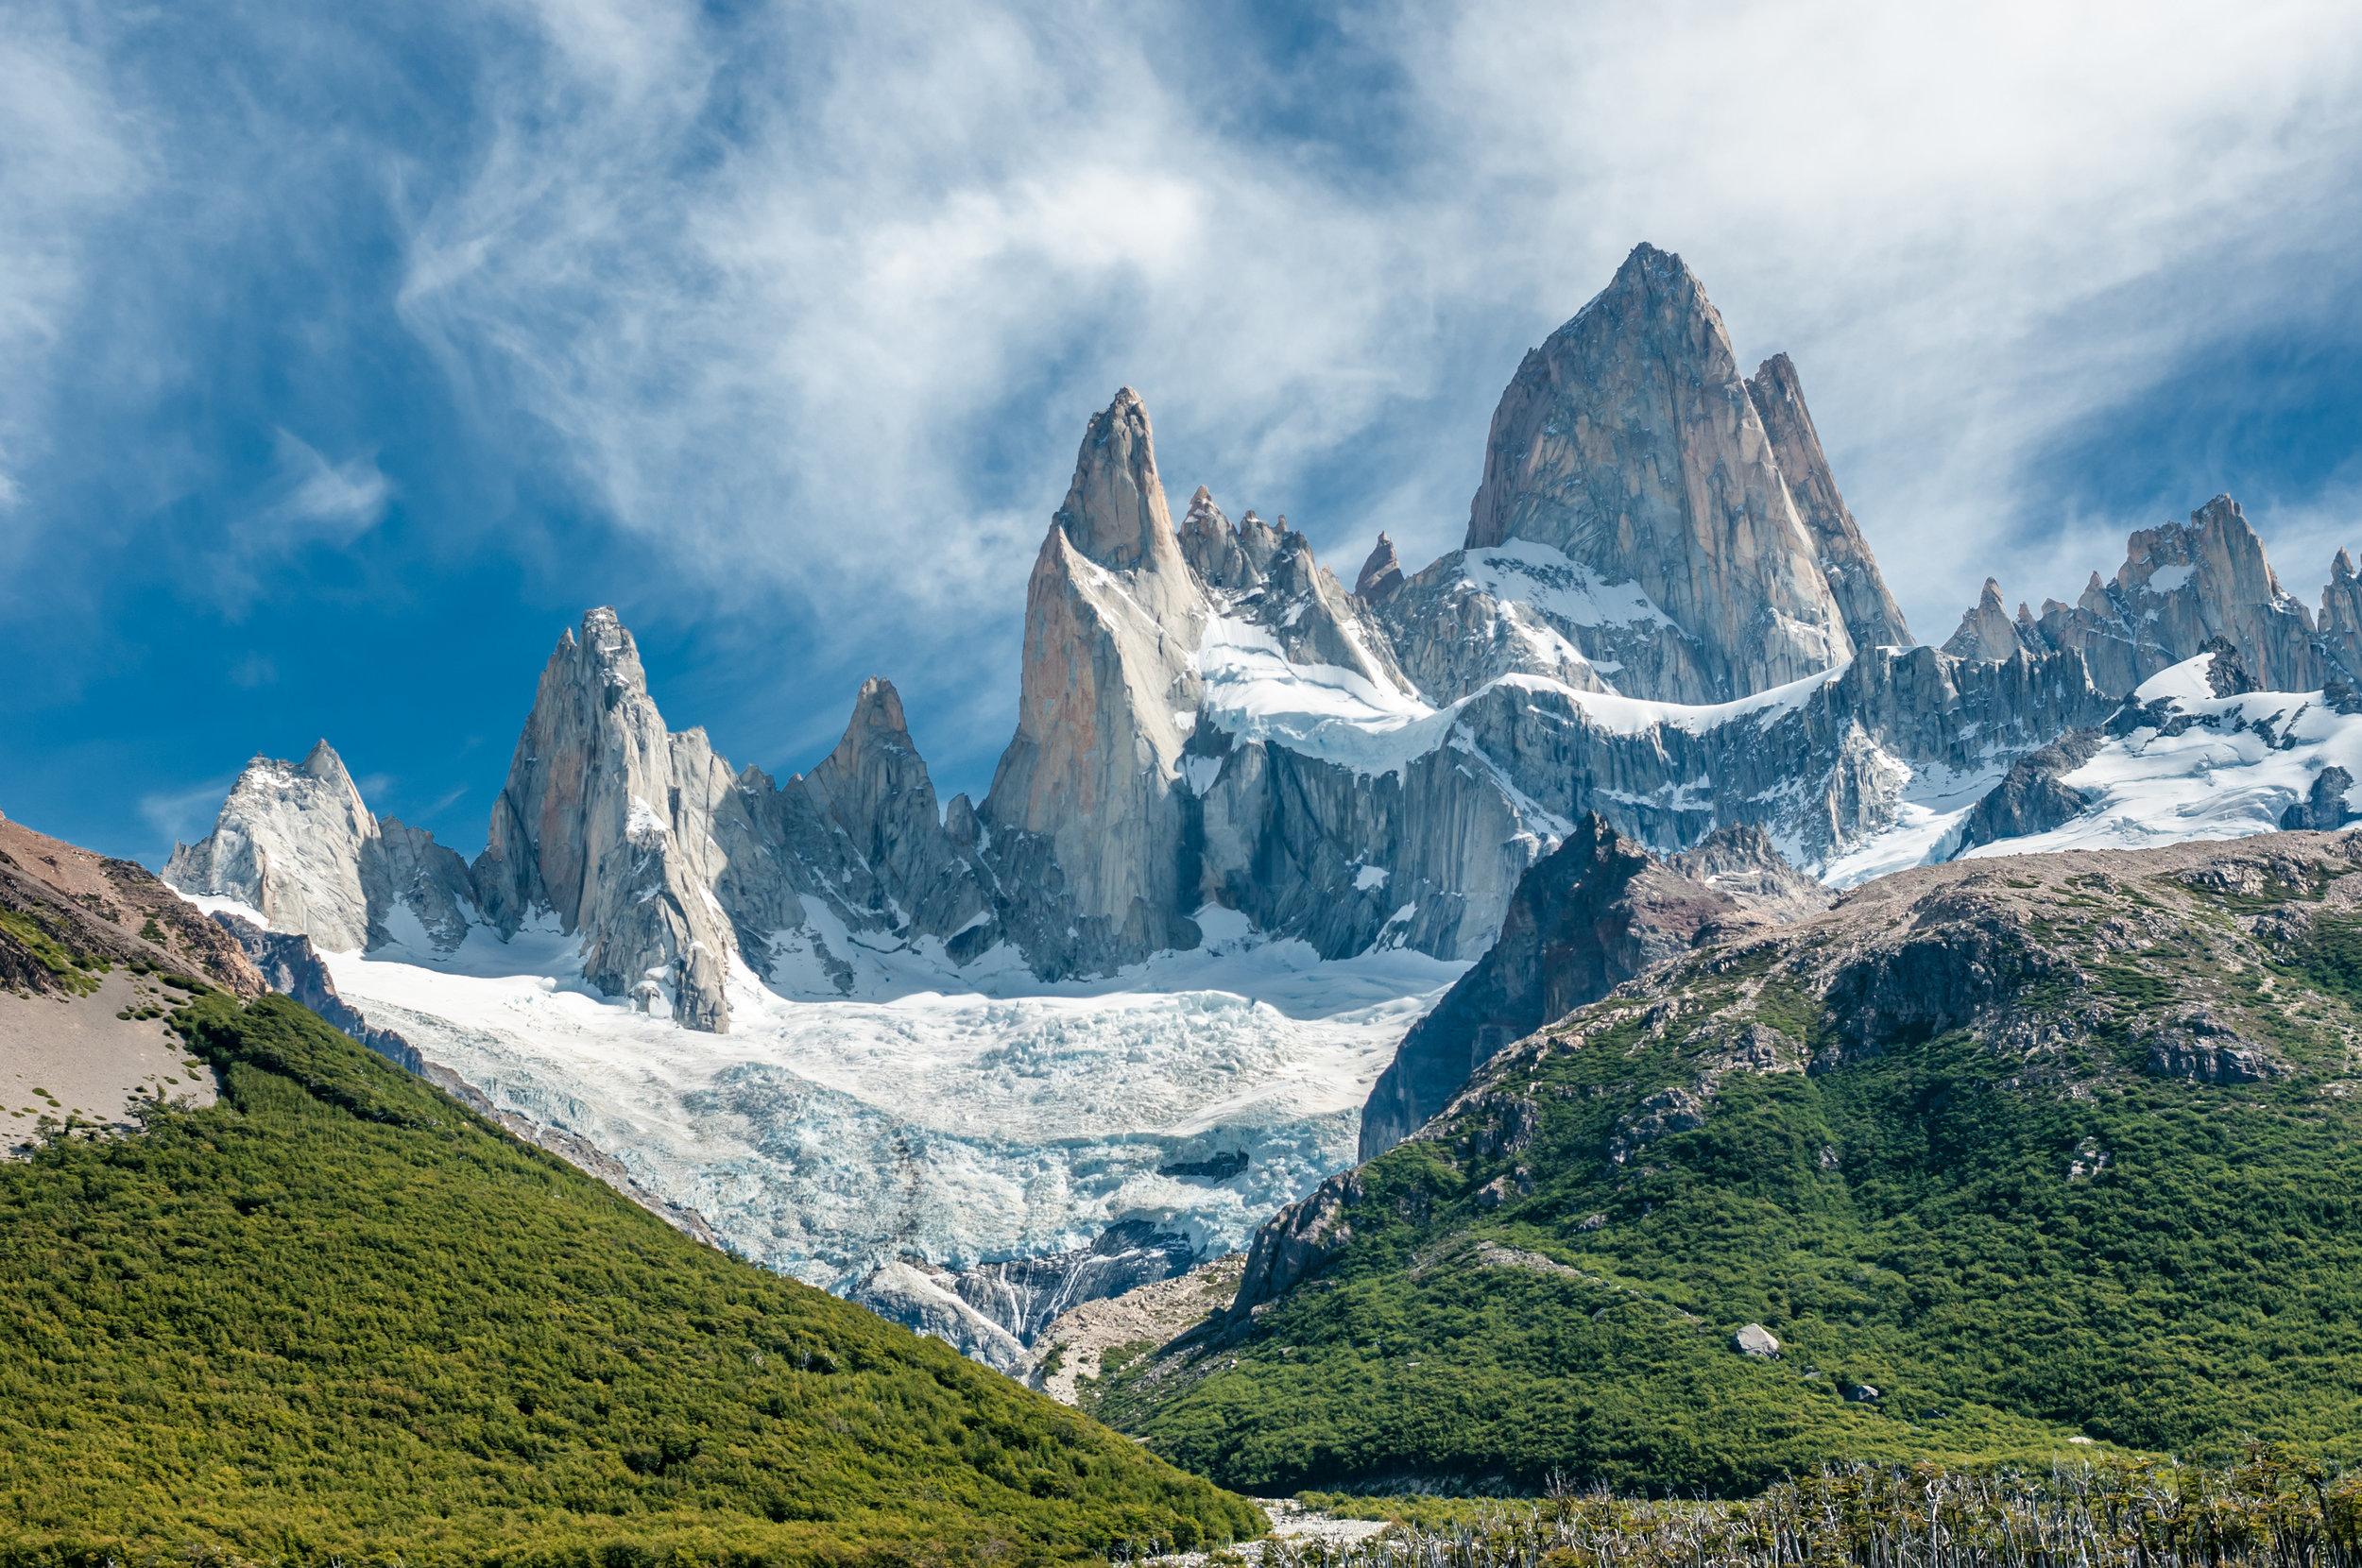 Opplev Patagonias skjønnhet: Buenos Aires, Puerto Madryn, Ushuaia, Perito Moreno m.m